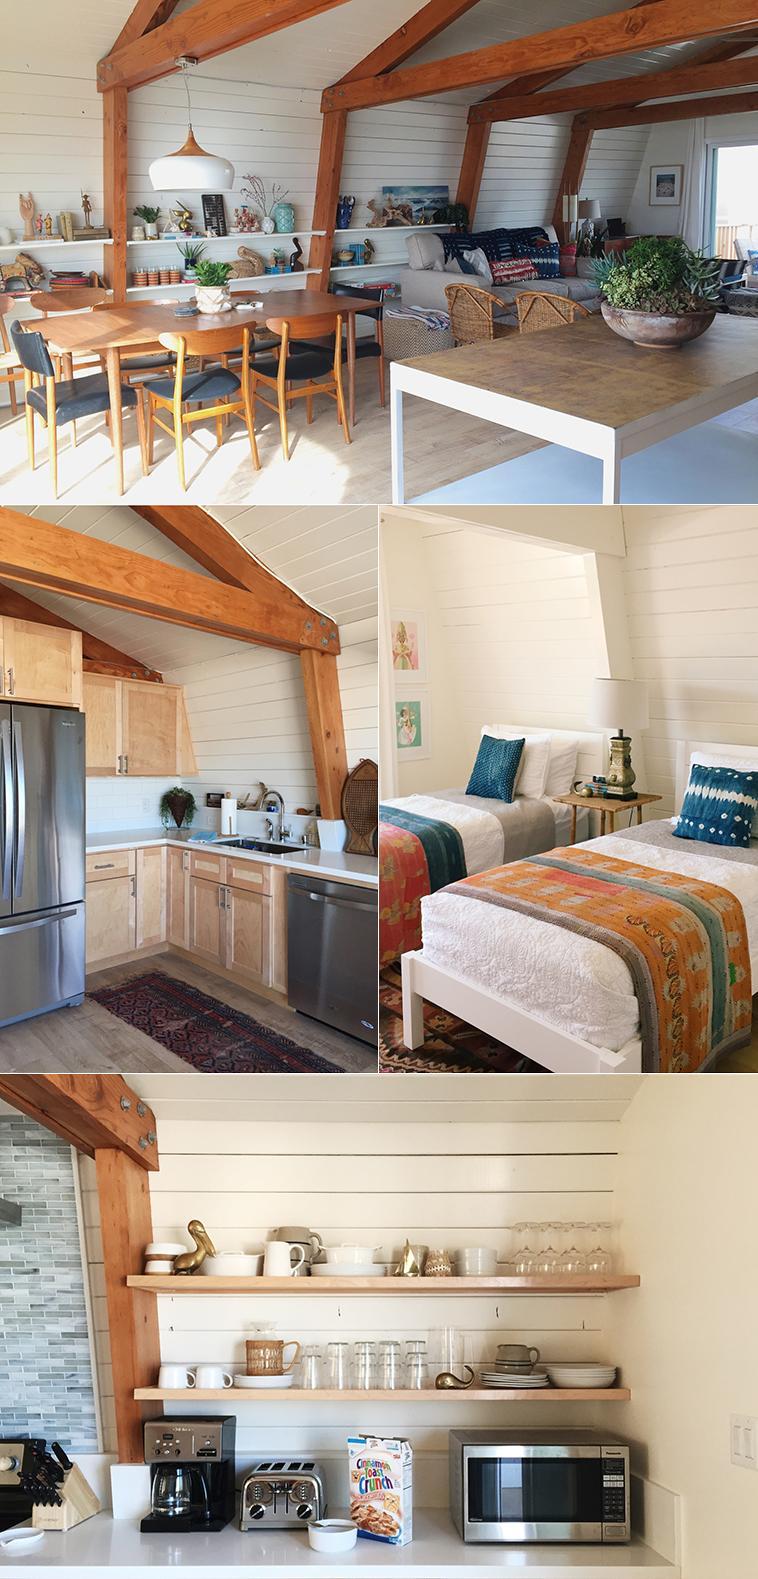 Beach Lodge in Oxnard, CA